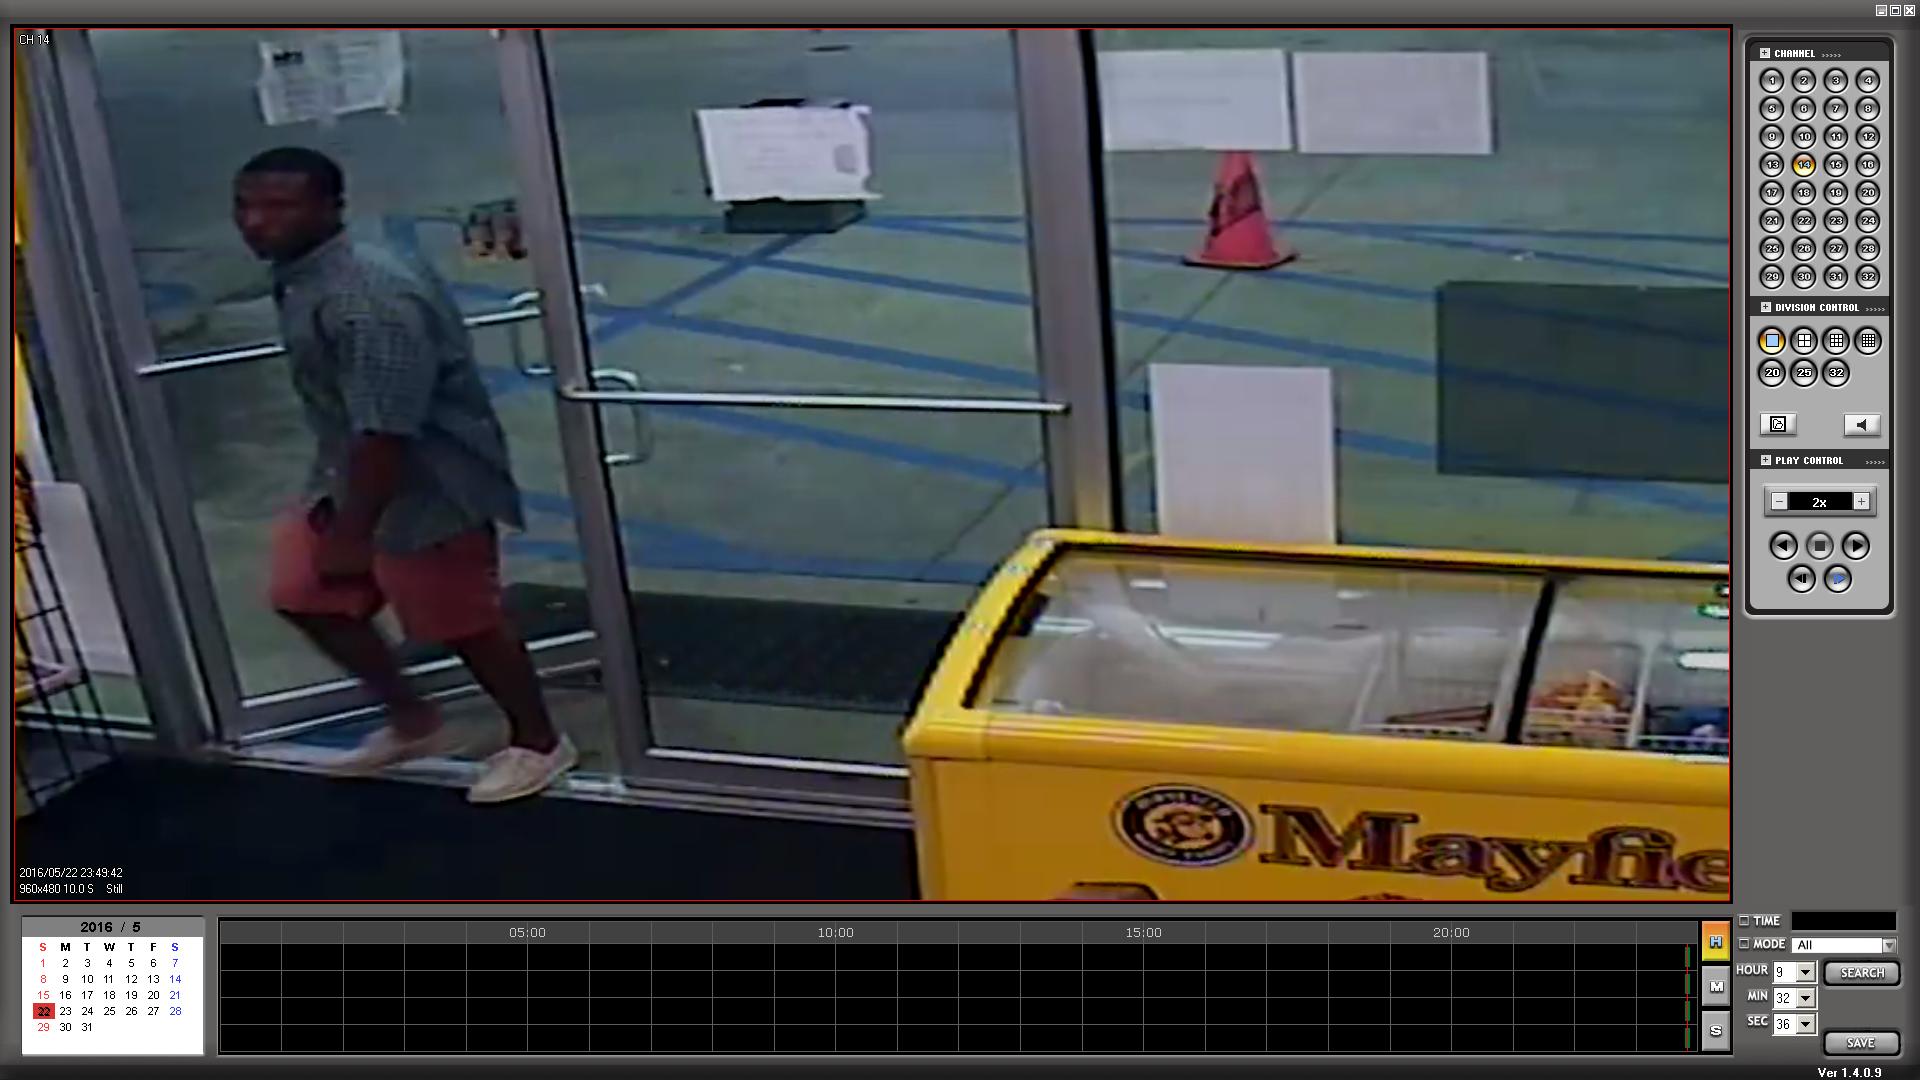 Birmingham PD needs help locating robbery suspect